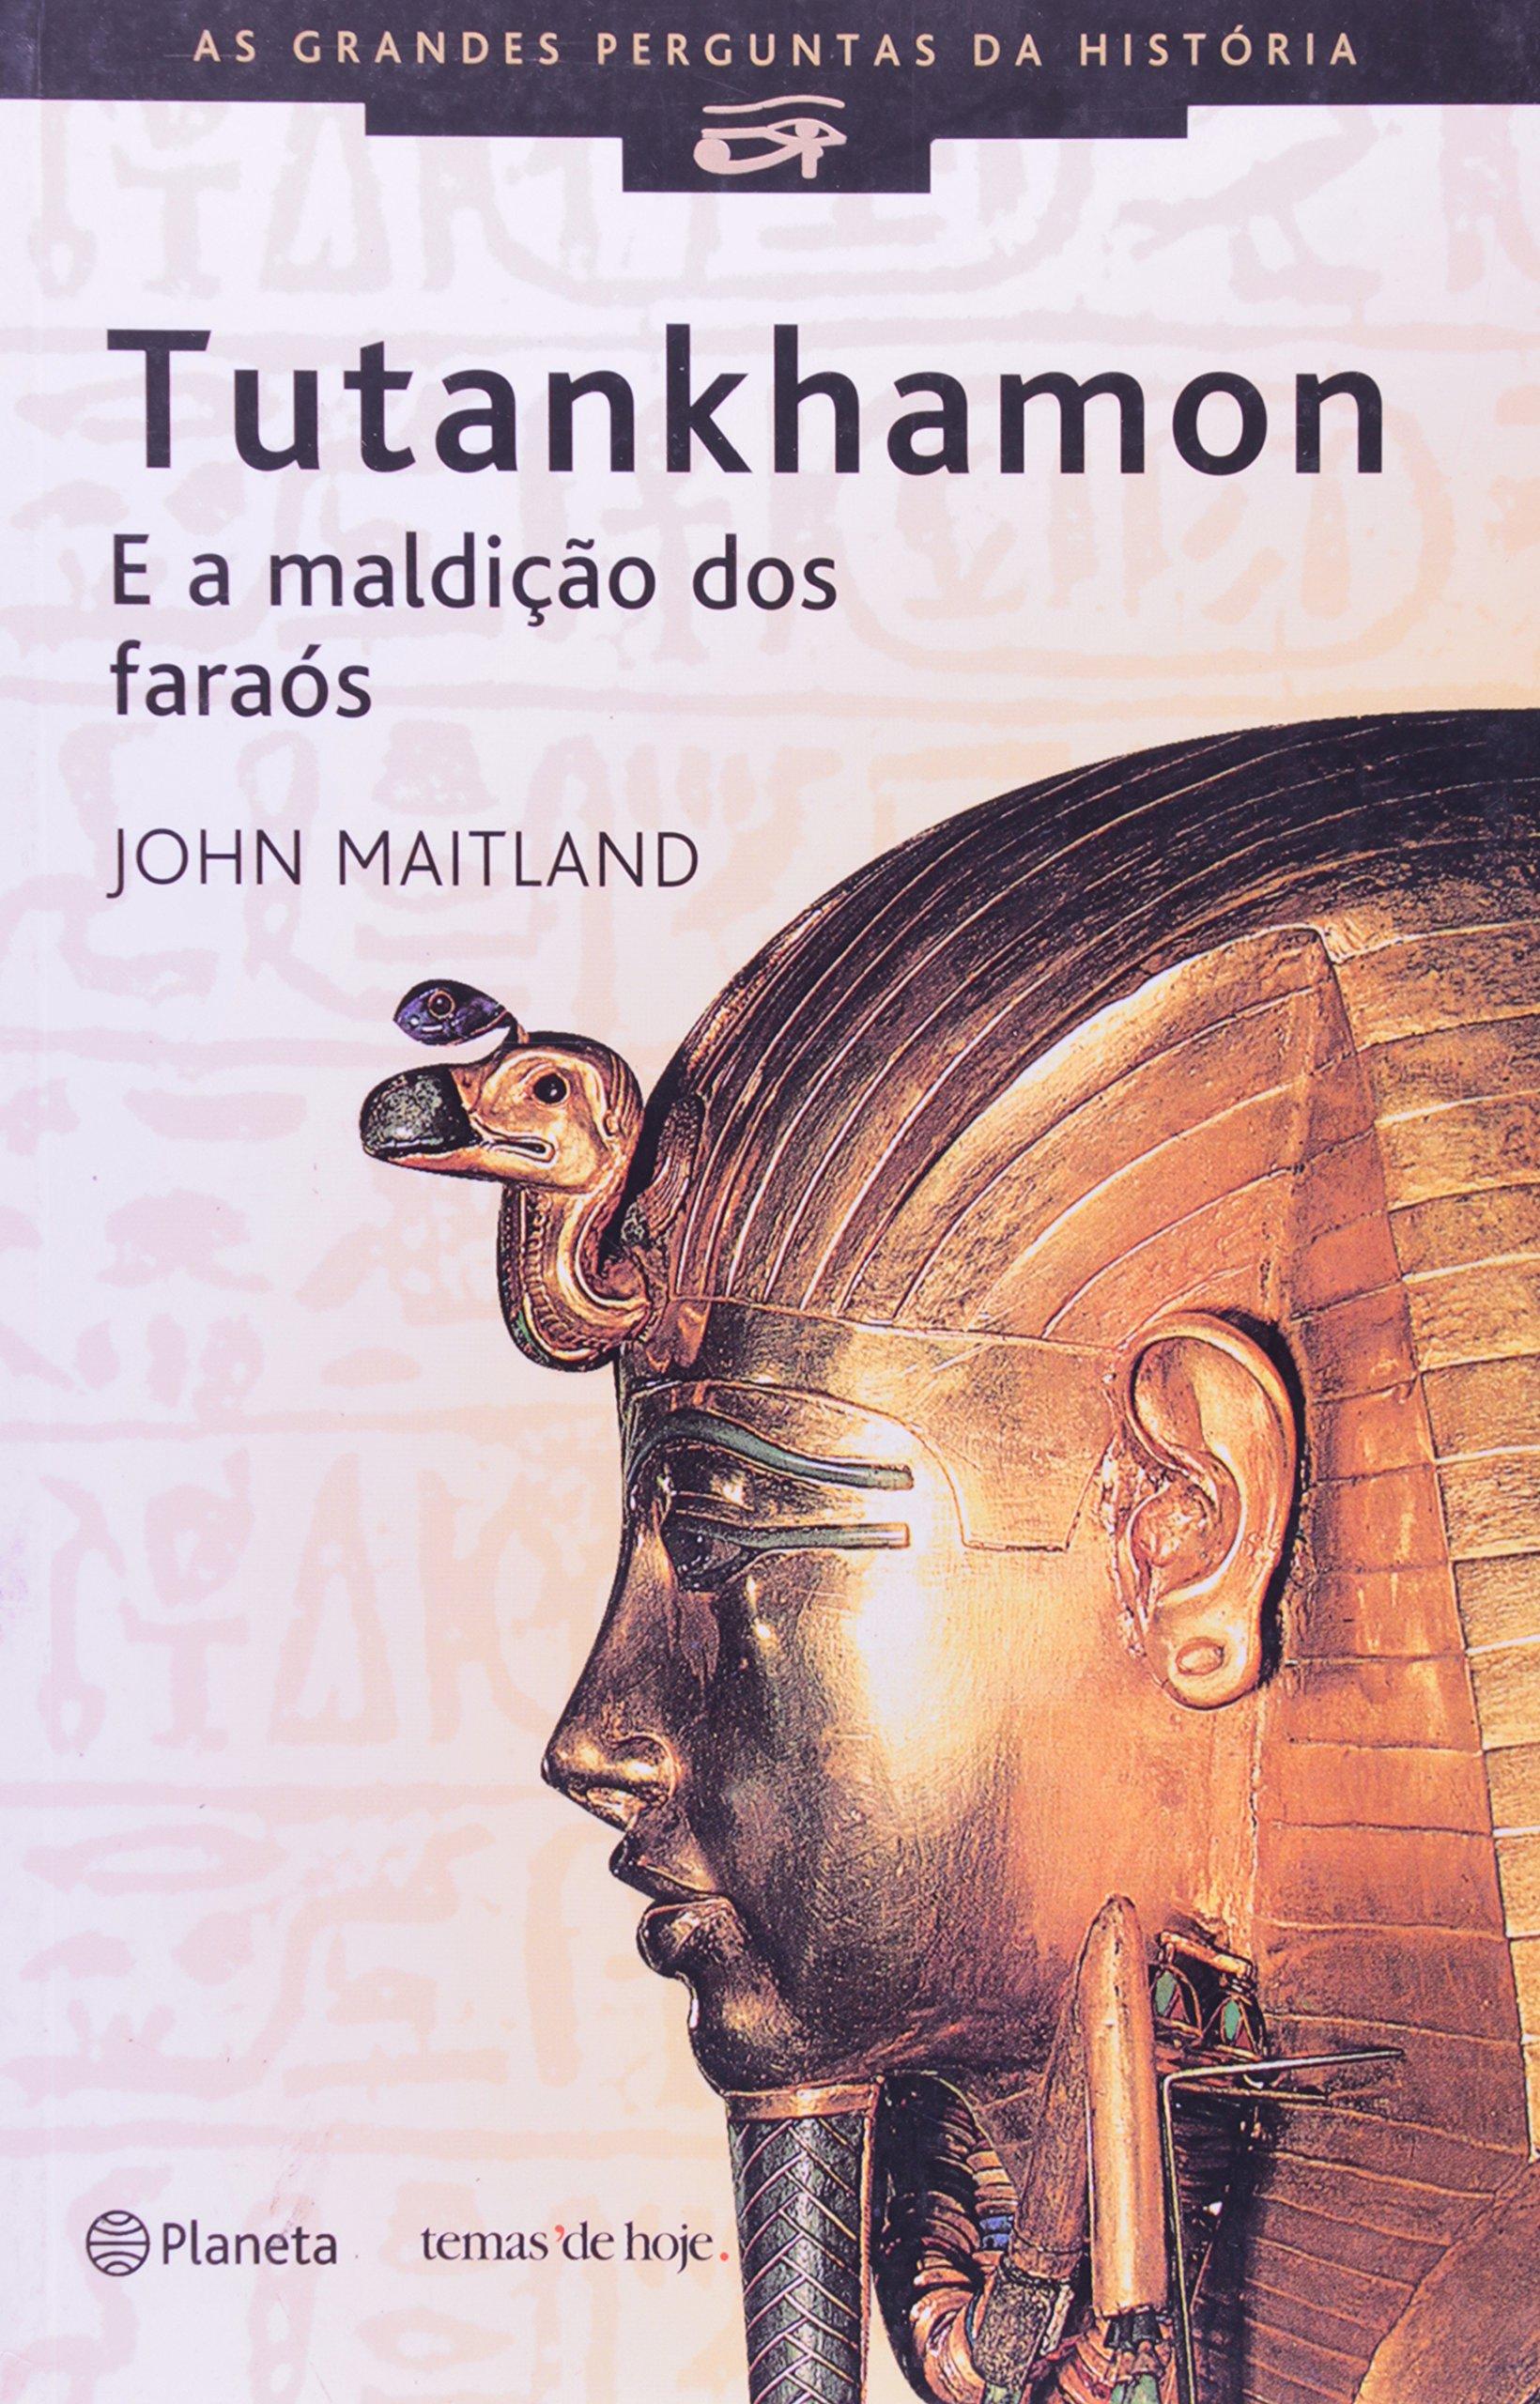 Tutankhamon E A Maldição Dos Faraós: Amazon.es: John Maitland: Libros